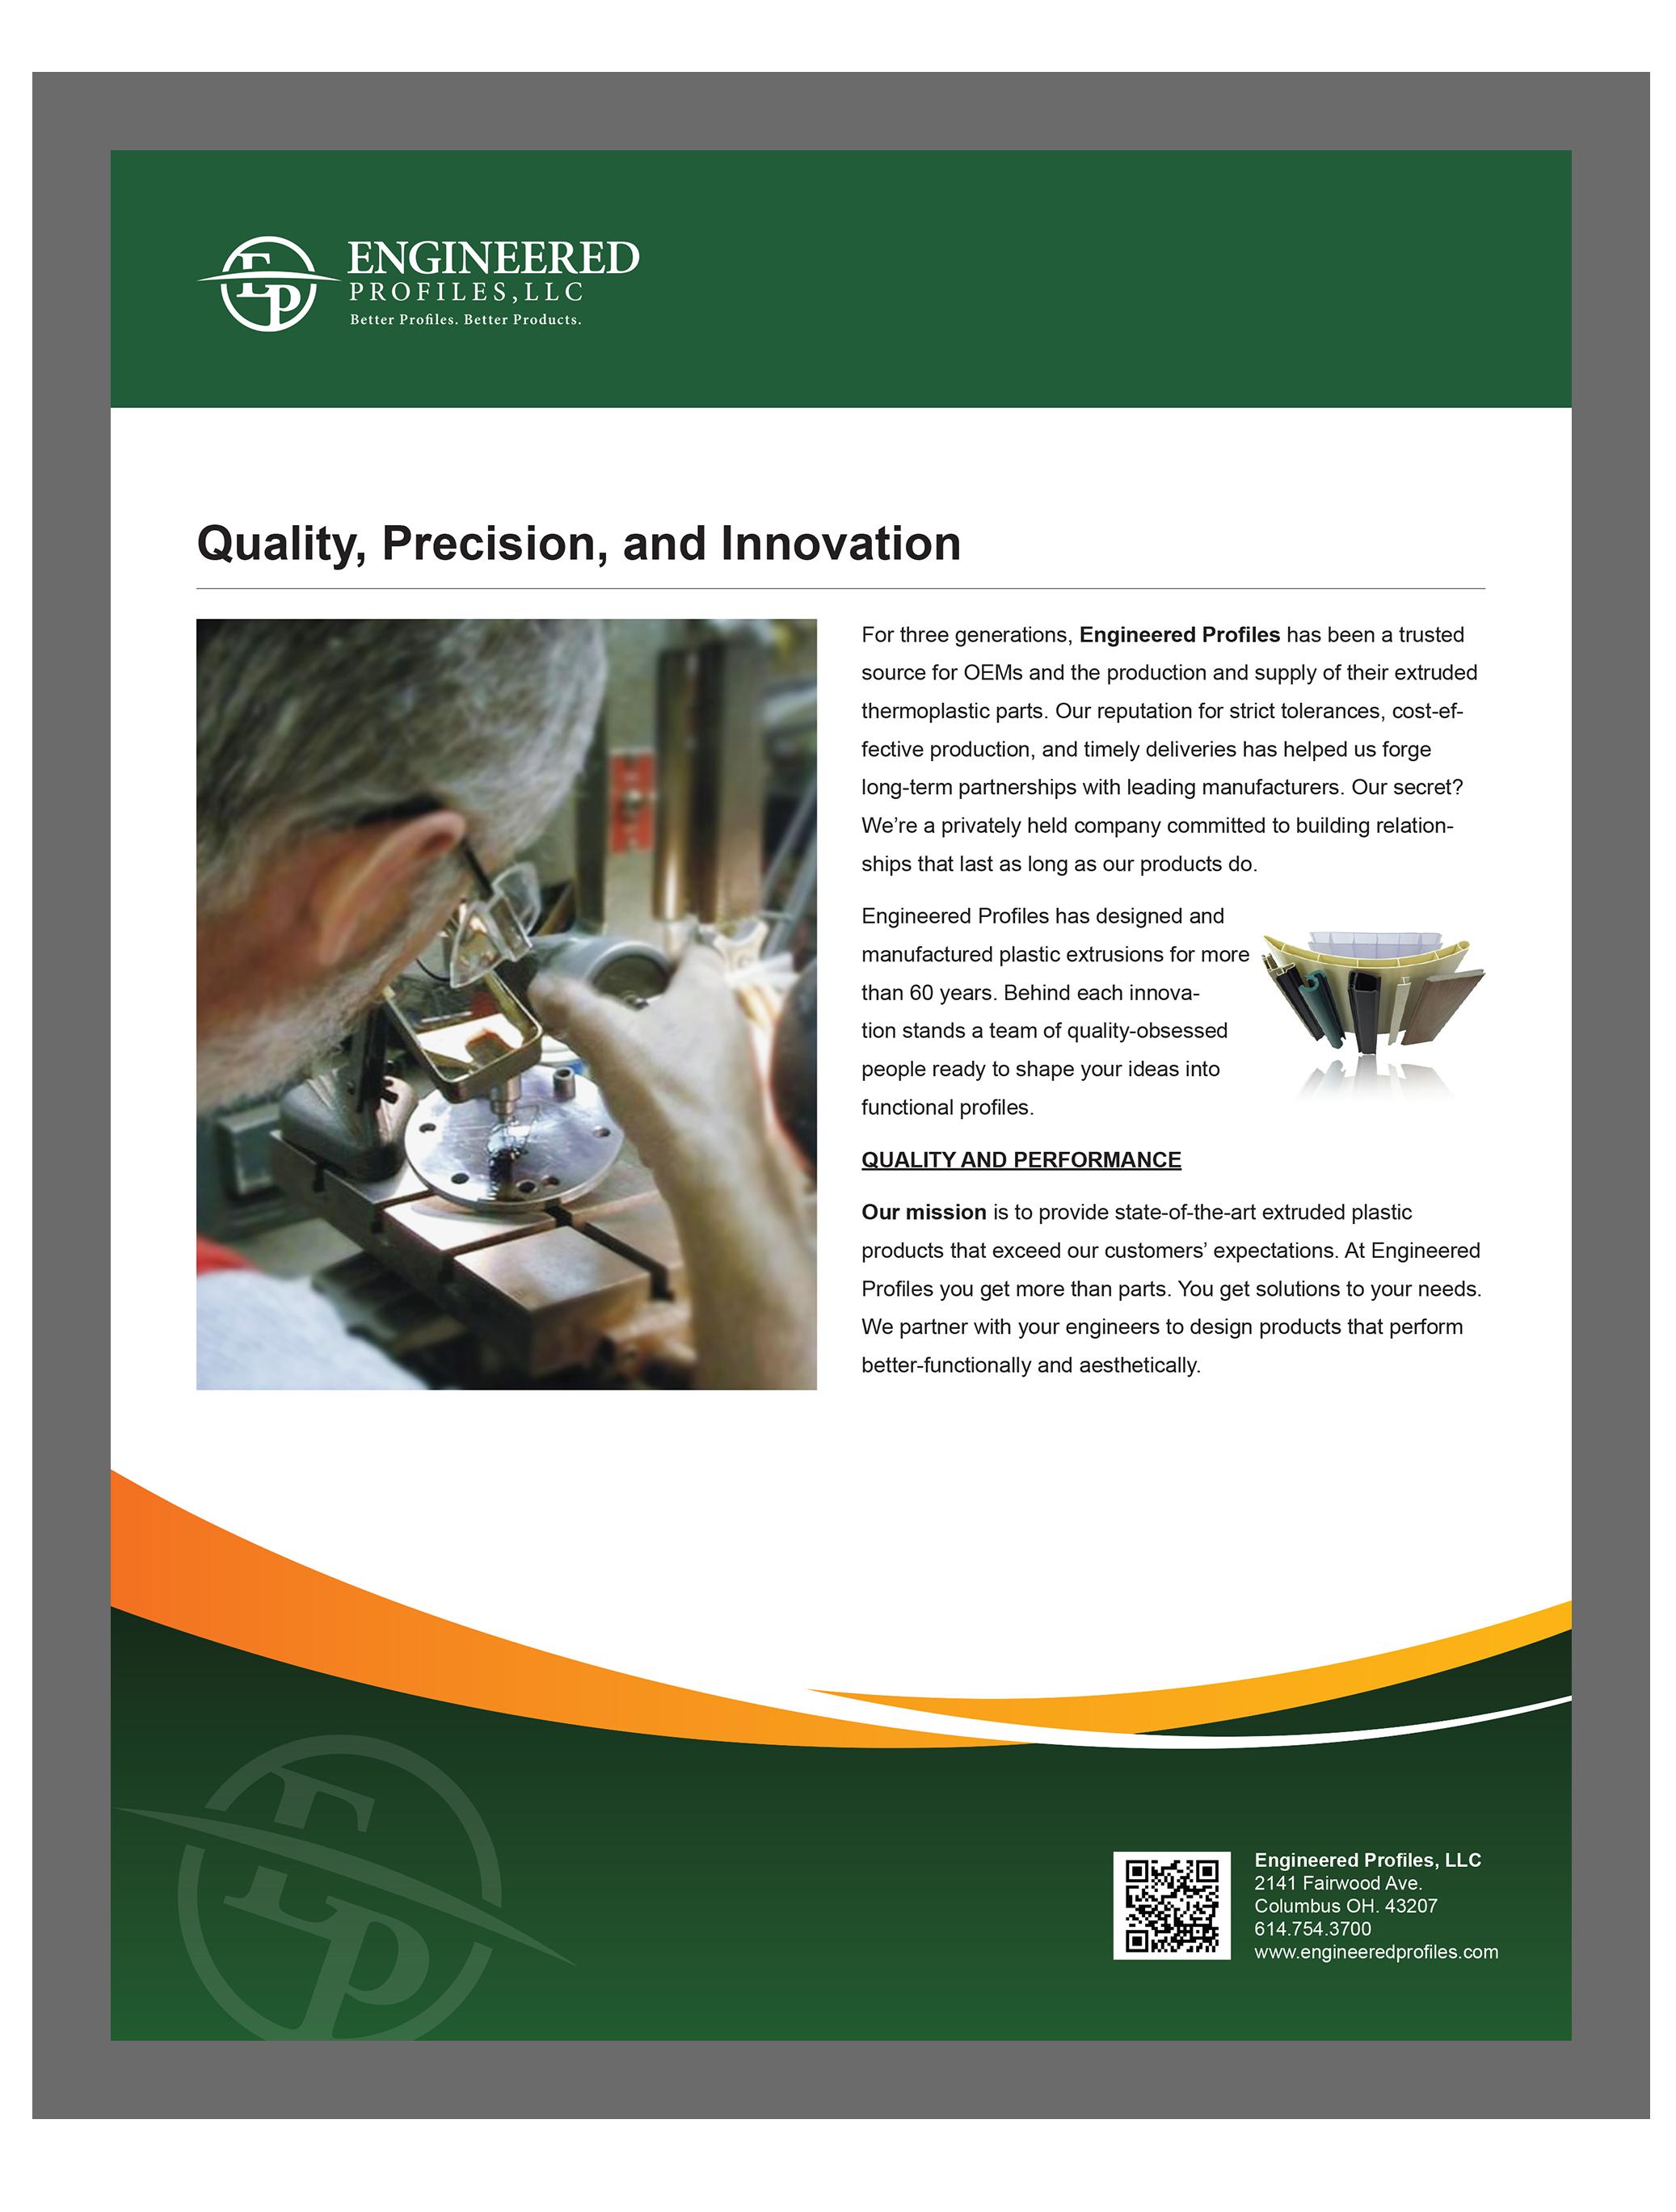 Engineered-Profiles_Brochure_Sep_2014